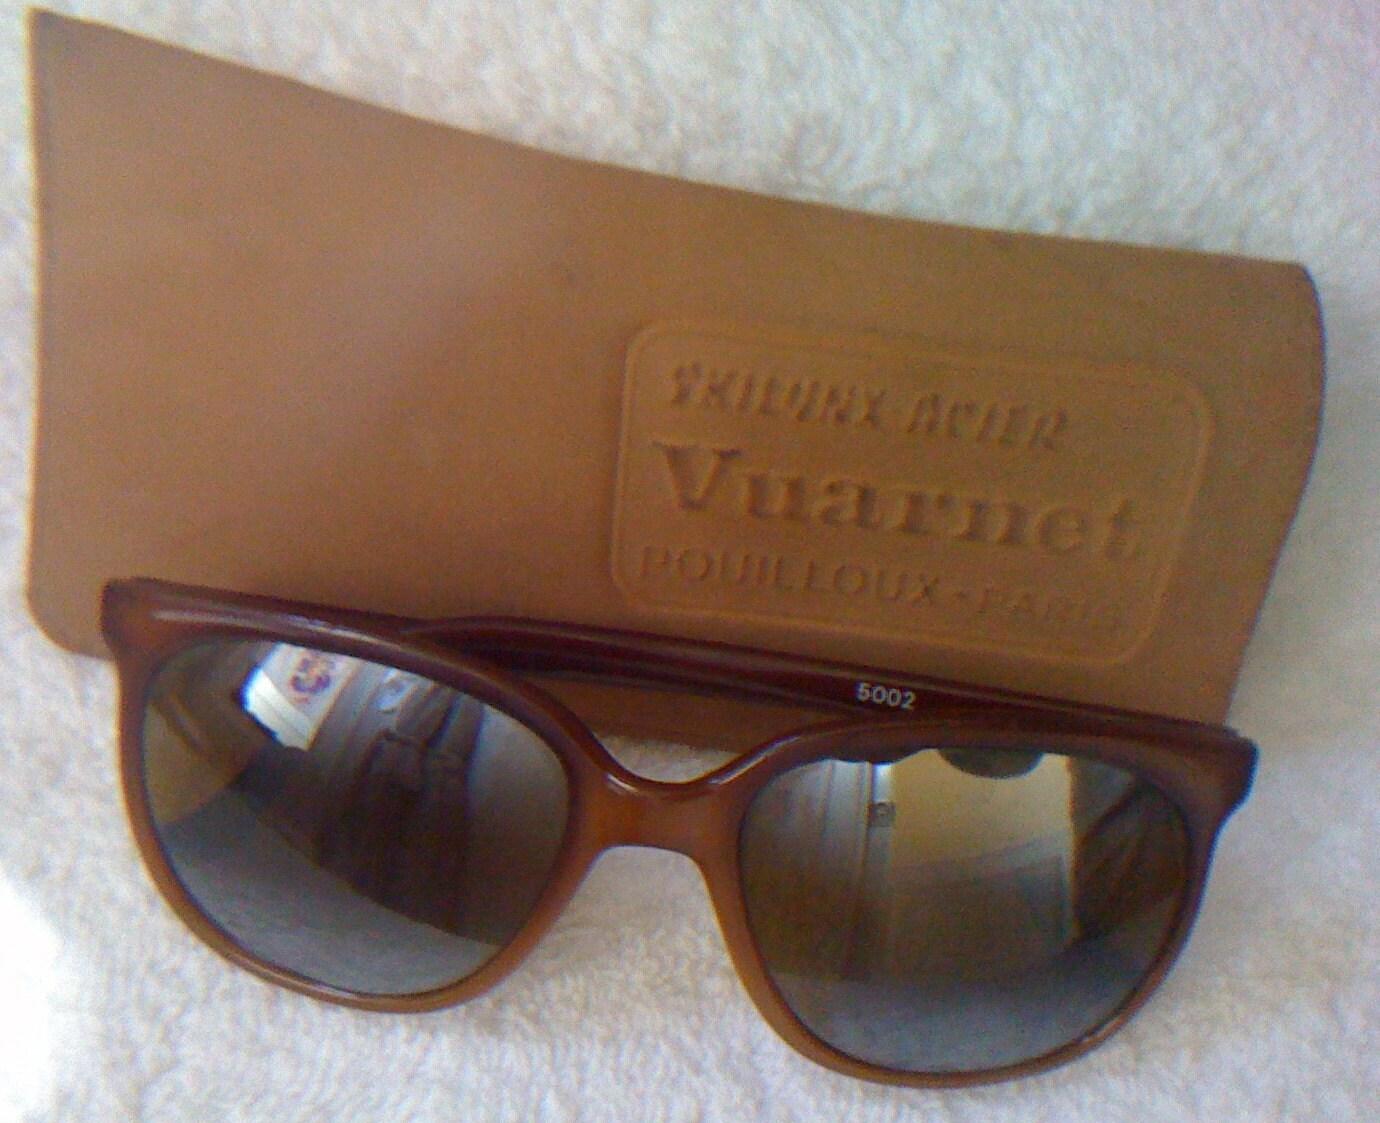 vuarnet sunglasses yest  vuarnet sunglasses pouilloux 438